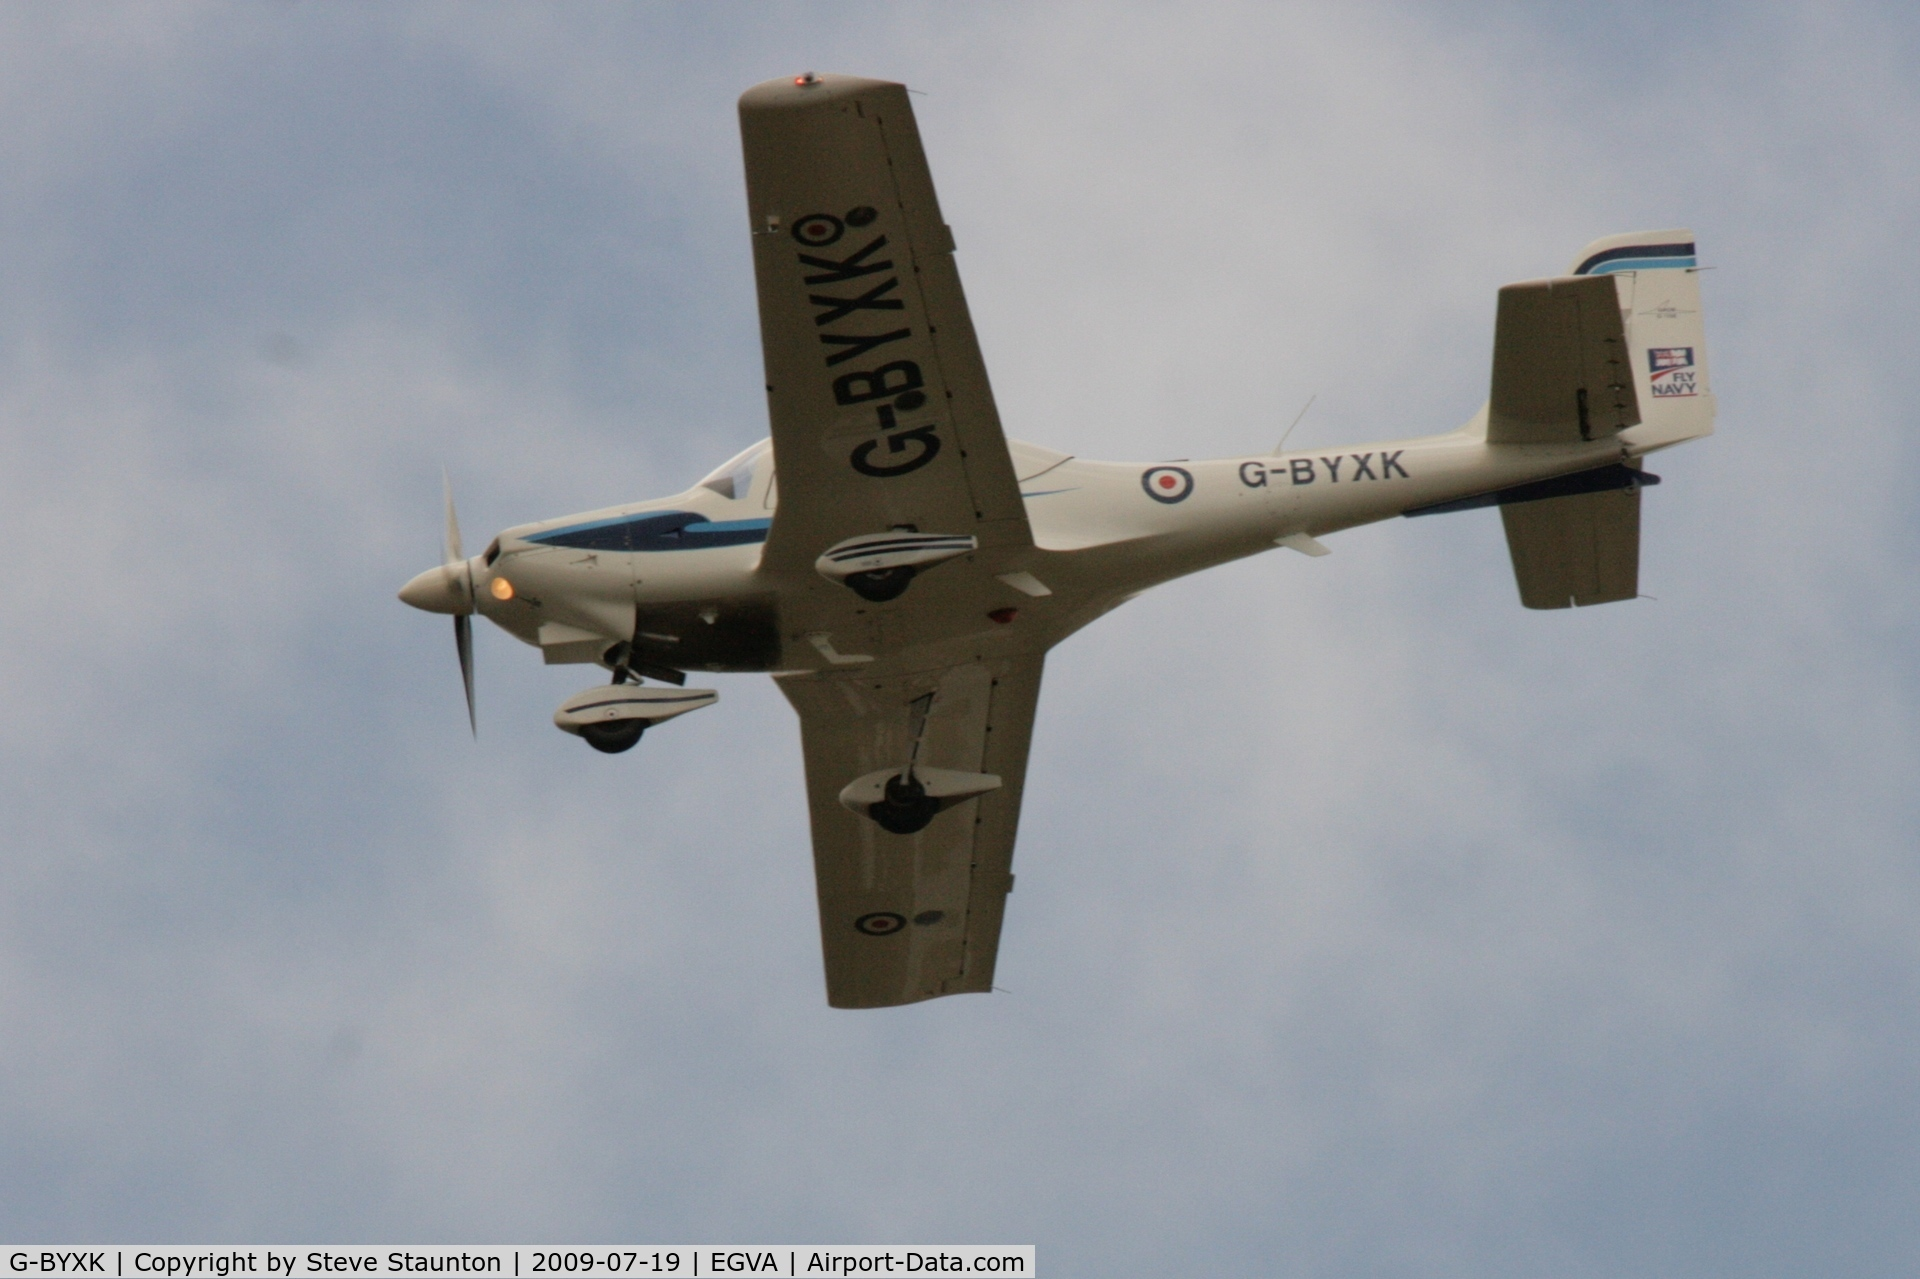 G-BYXK, 2001 Grob G-115E Tutor T1 C/N 82171/E, Taken at the Royal International Air Tattoo 2009